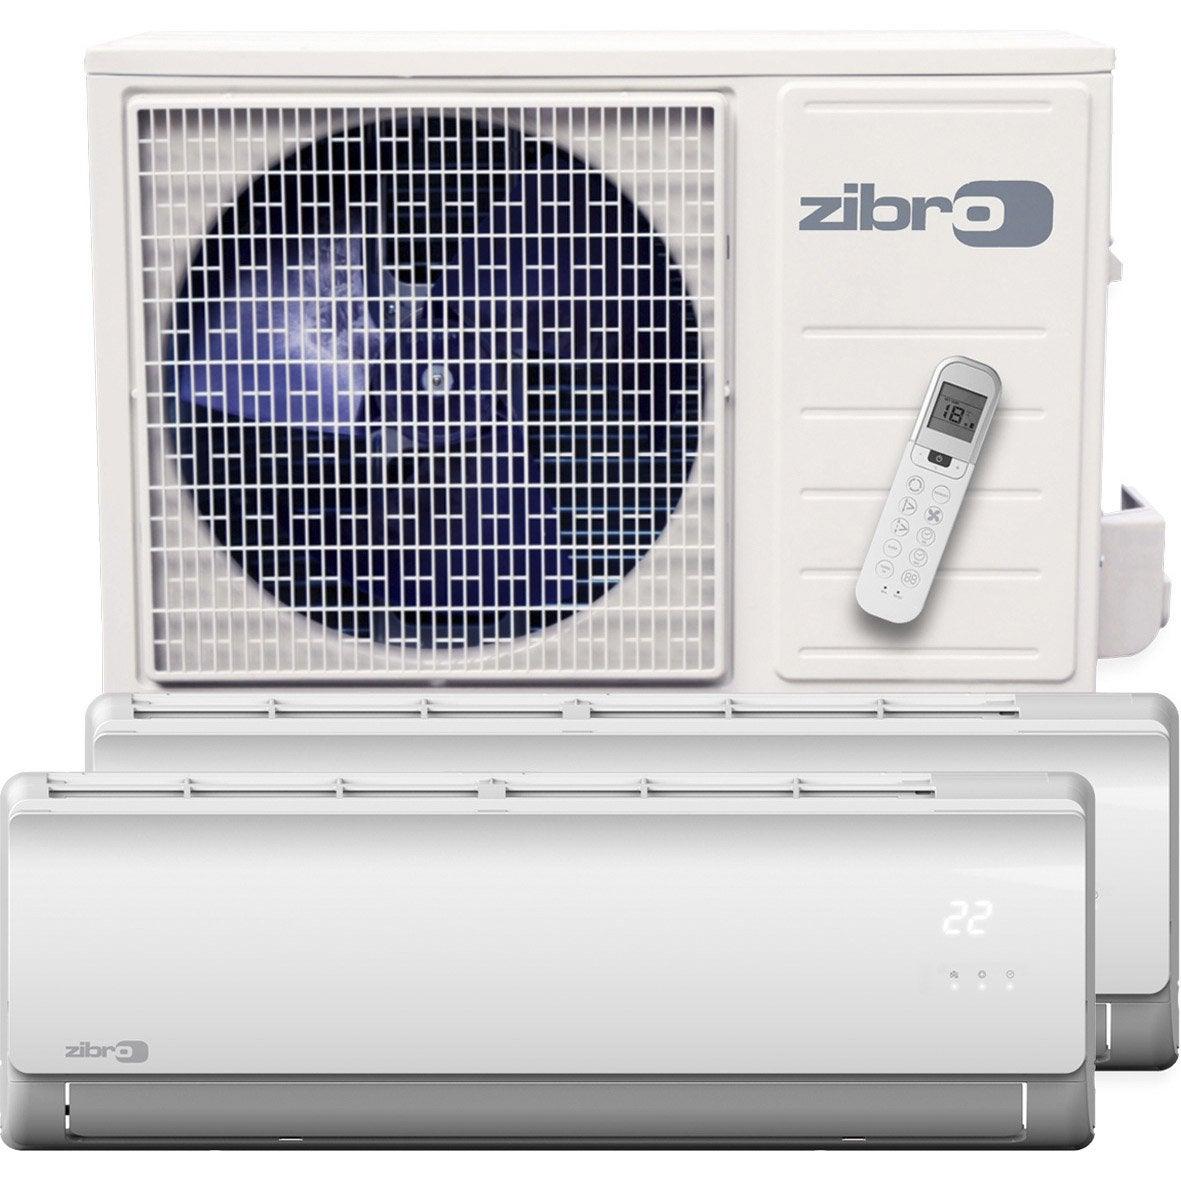 Pompe chaleur air air pack bisplit sm33 duo zibro 5600w for Zibro kristal leroy merlin